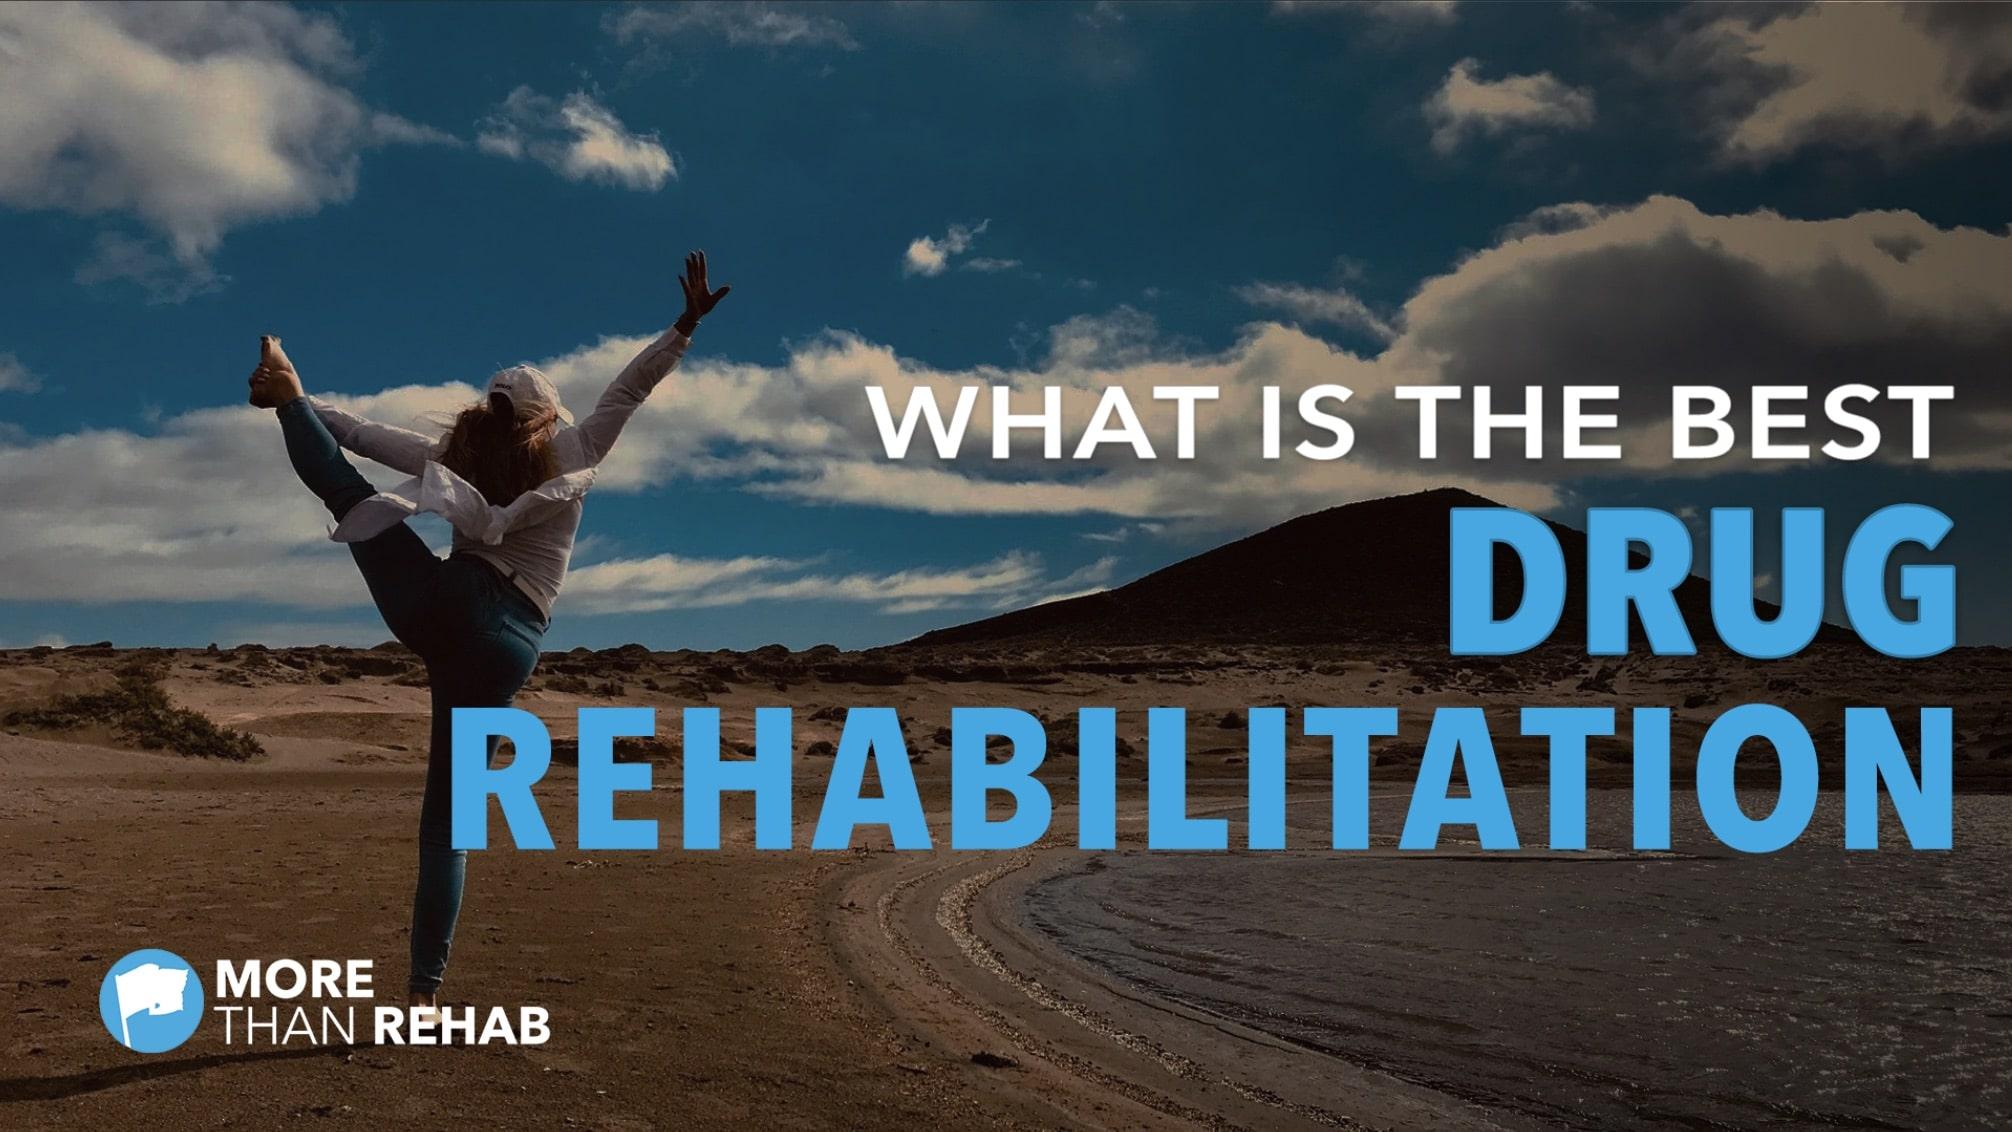 what-is-the-best-drug-rehabilitation-Houston-Texas-detox-evidence-based-addiction-treatment